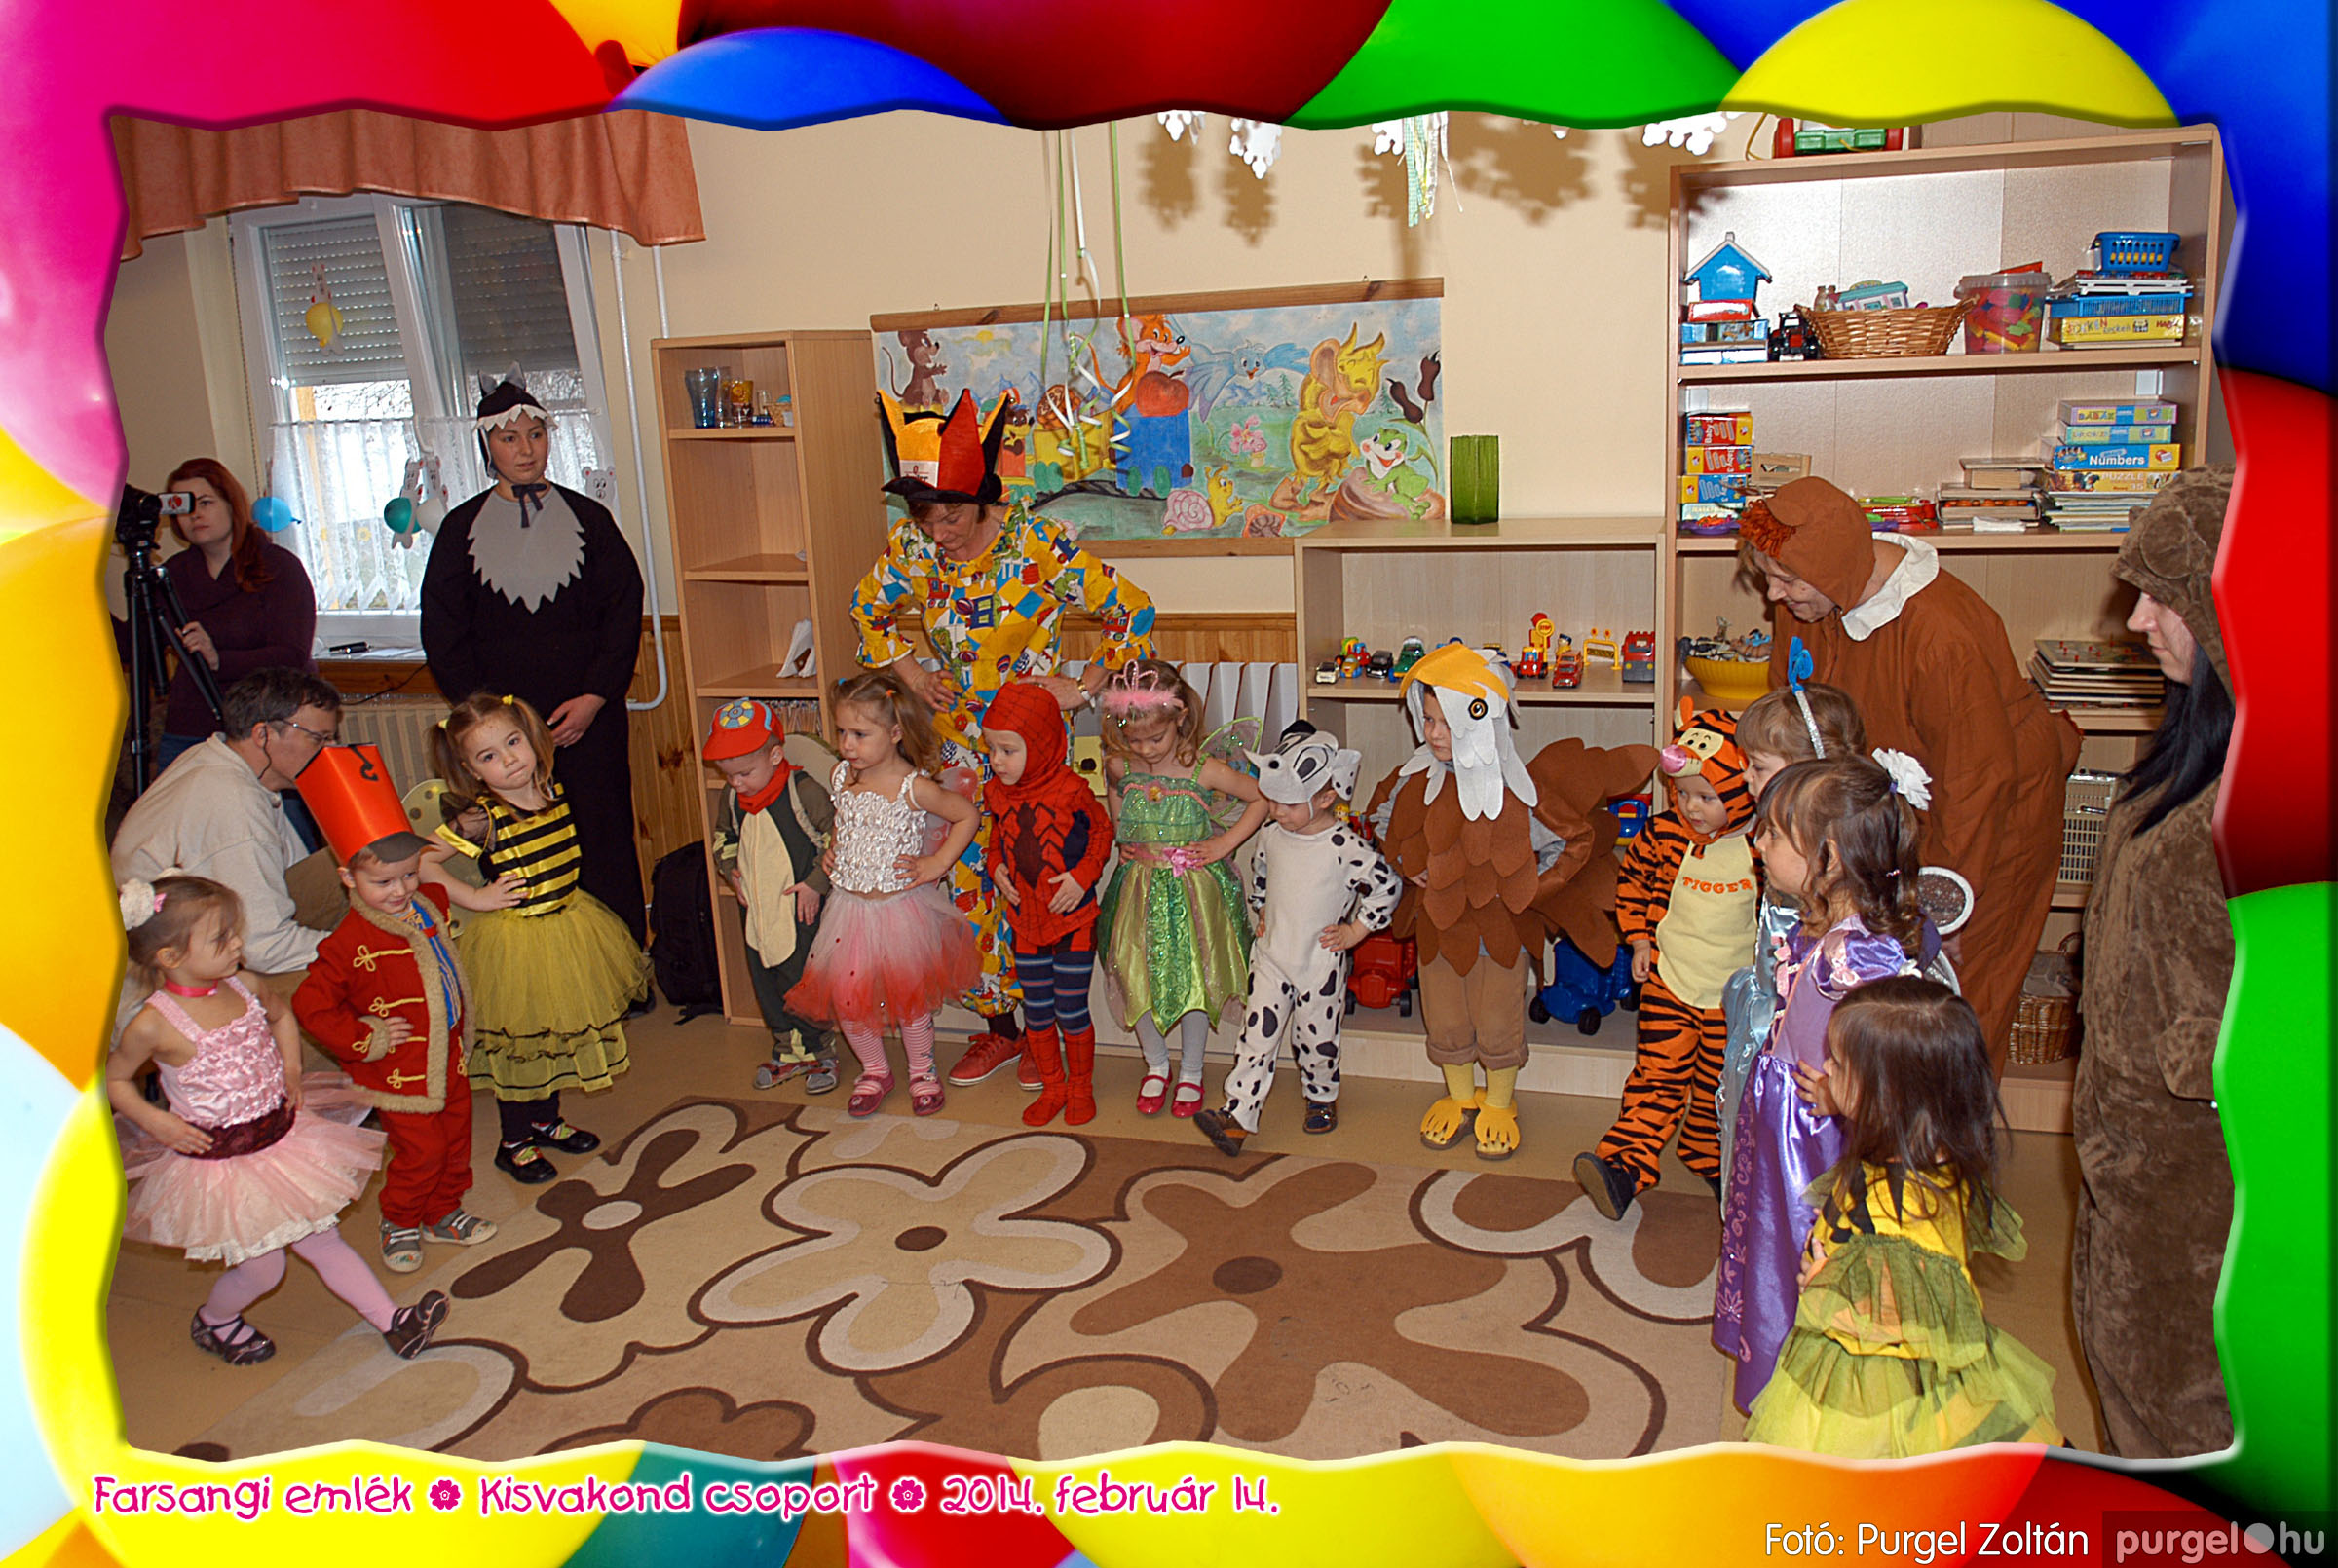 2014.02.14. 195 Kurca-parti Óvoda farsang 2014. - Kisvakond csoport - Fotó:PURGEL ZOLTÁN© 415.jpg